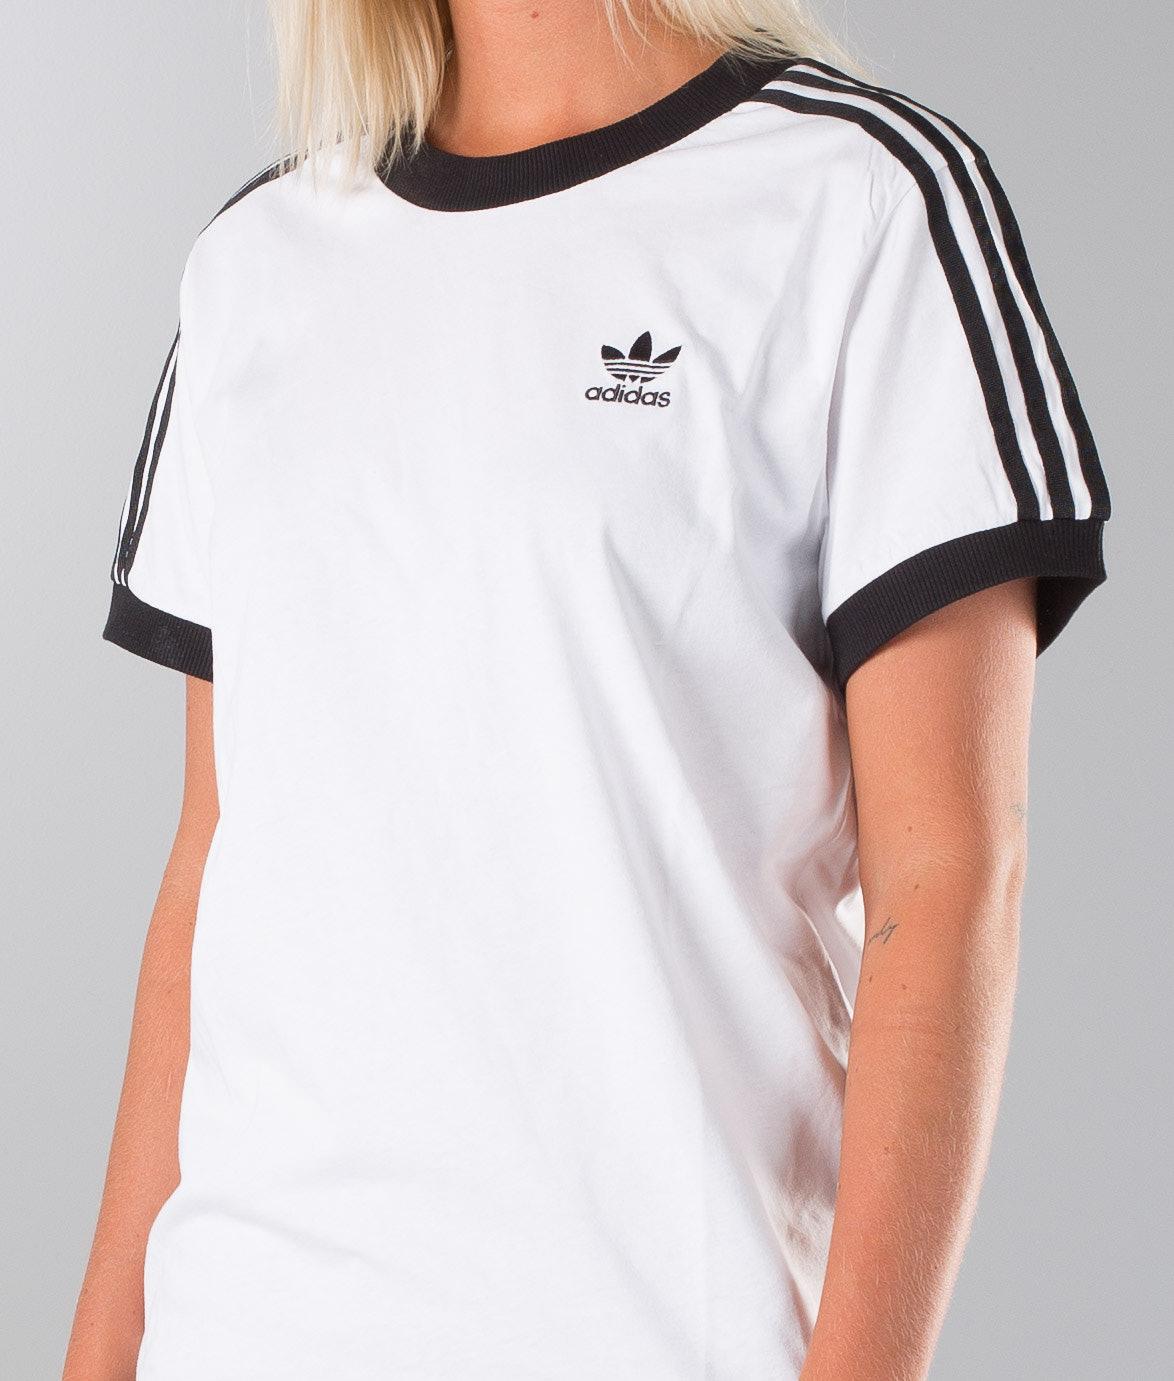 8171ee64cbdc89 Adidas Originals 3 Stripes T-shirt White - Ridestore.nl